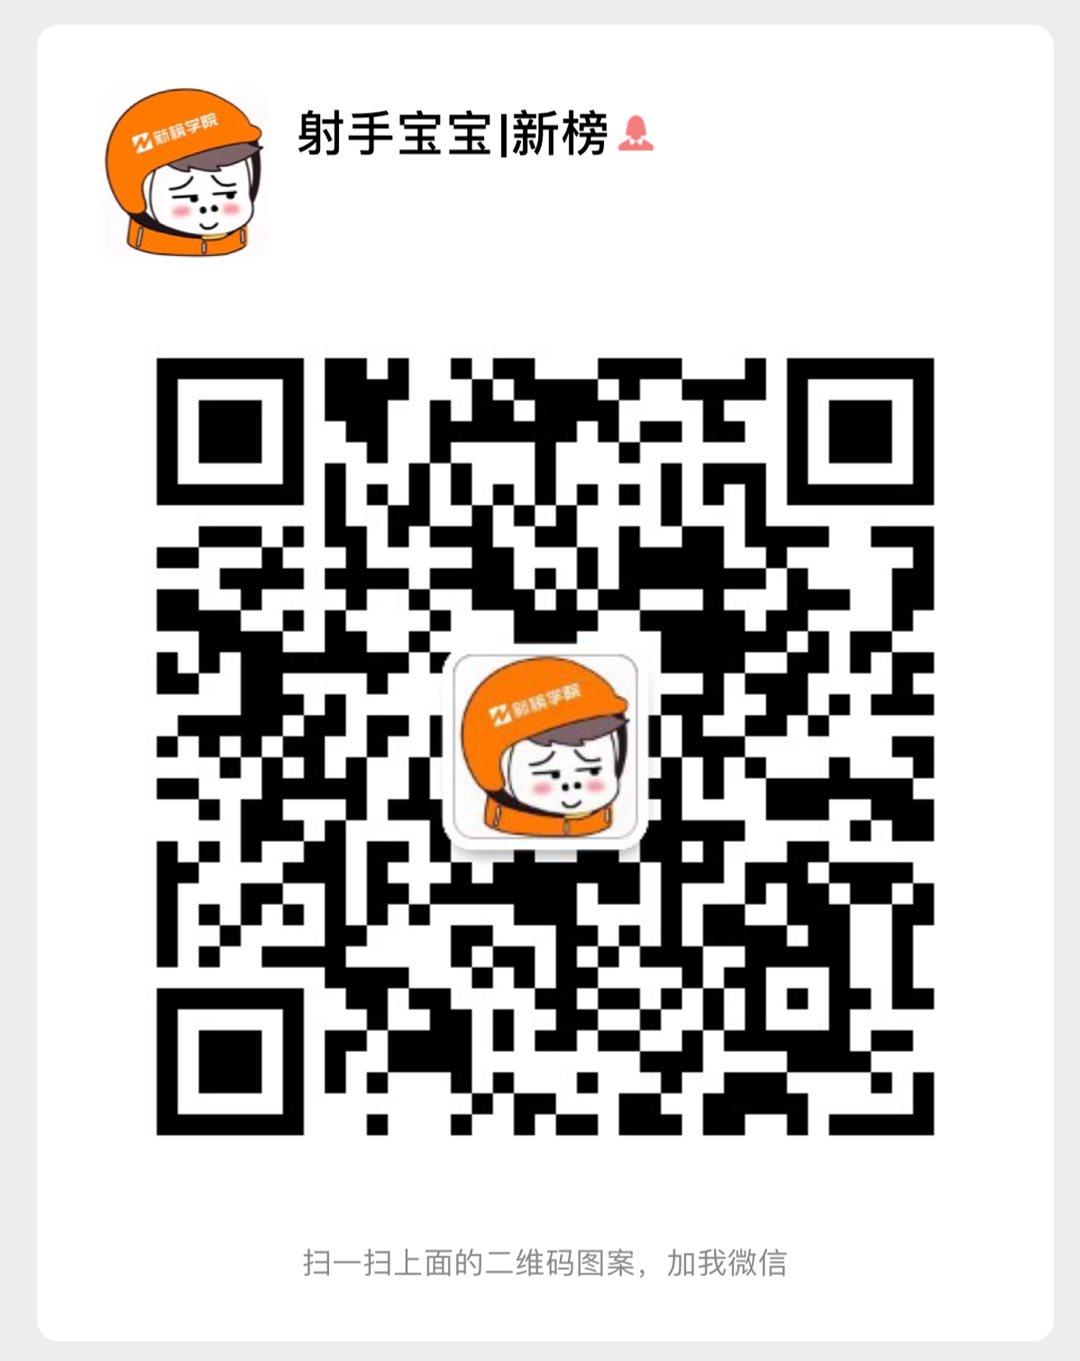 微信圖片_20190808164633.png